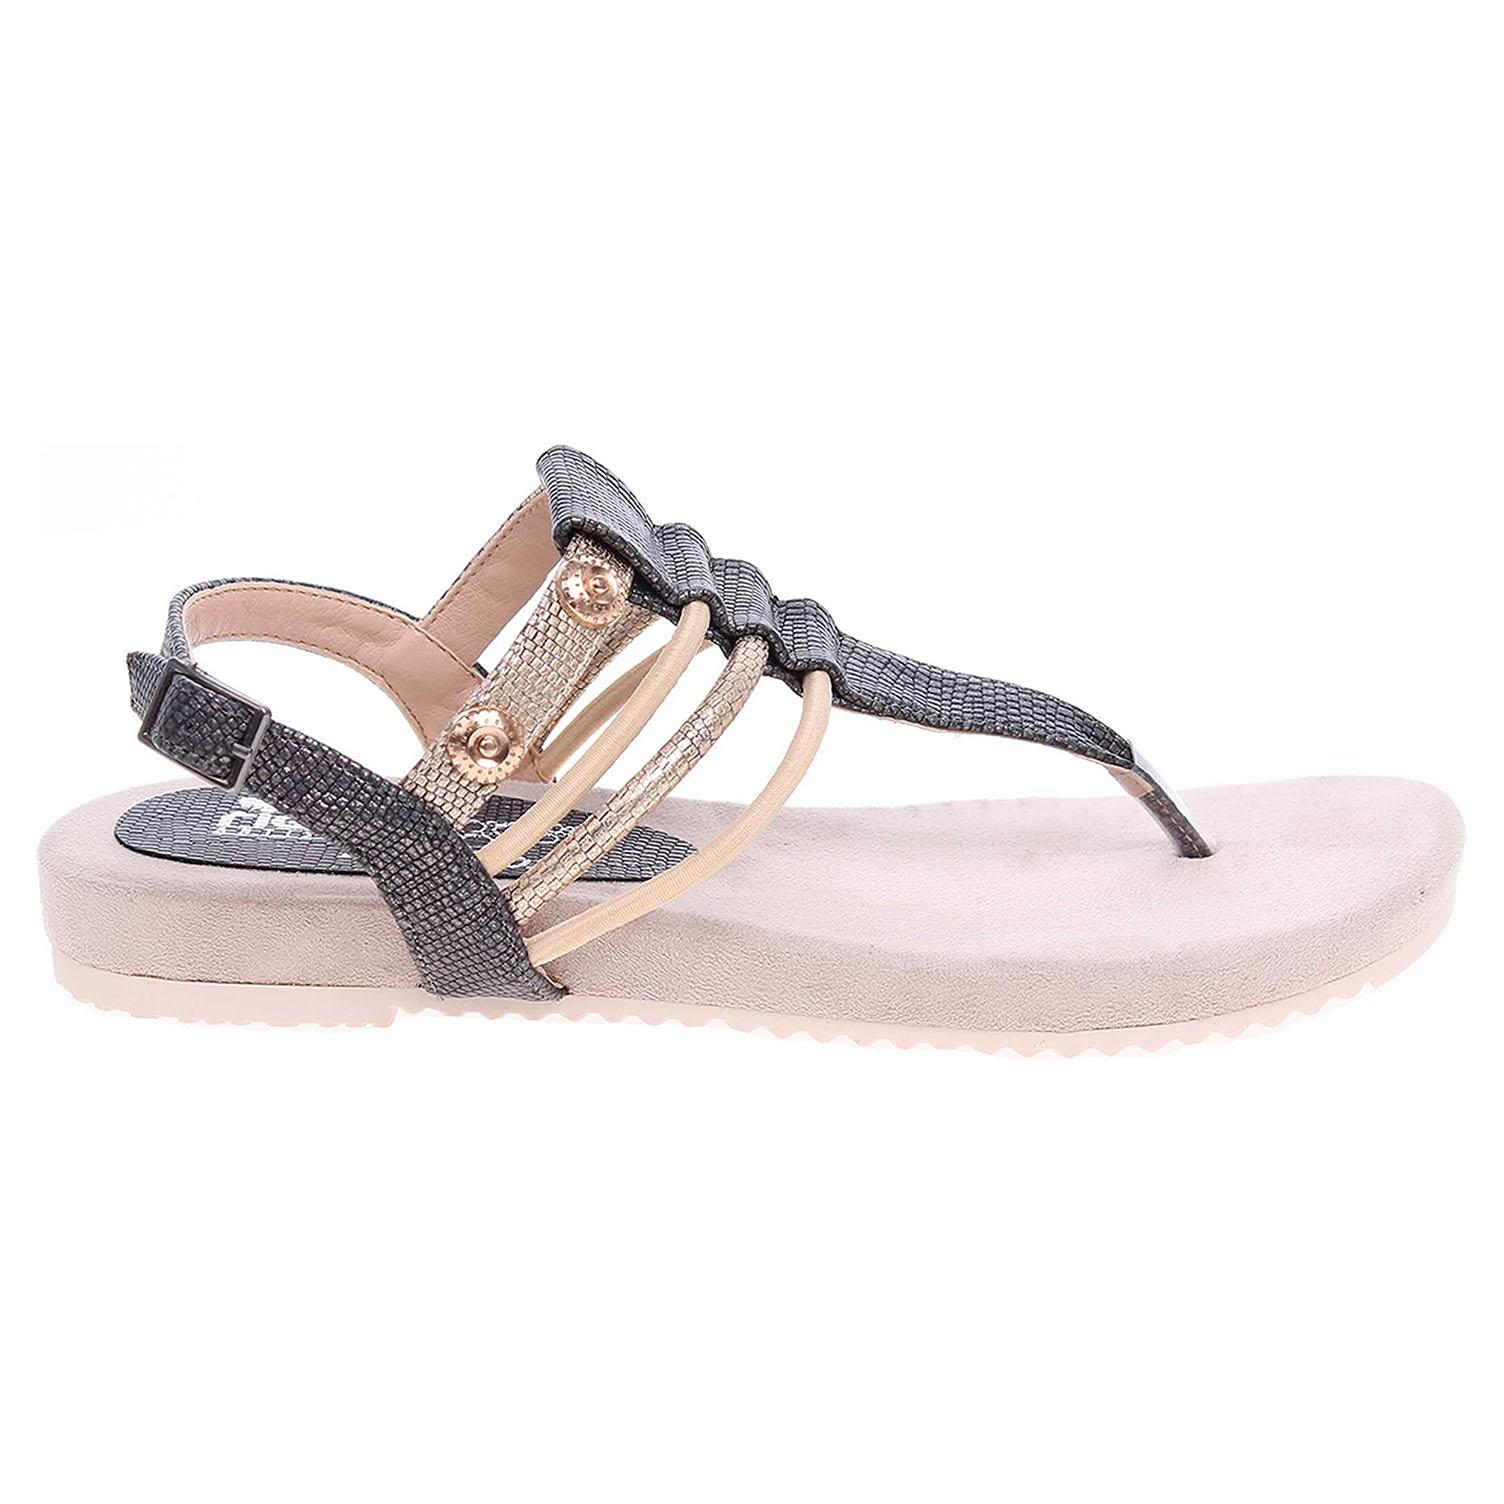 Ecco Rieker dámské sandály V5373-45 šedá-zlatá 23801156